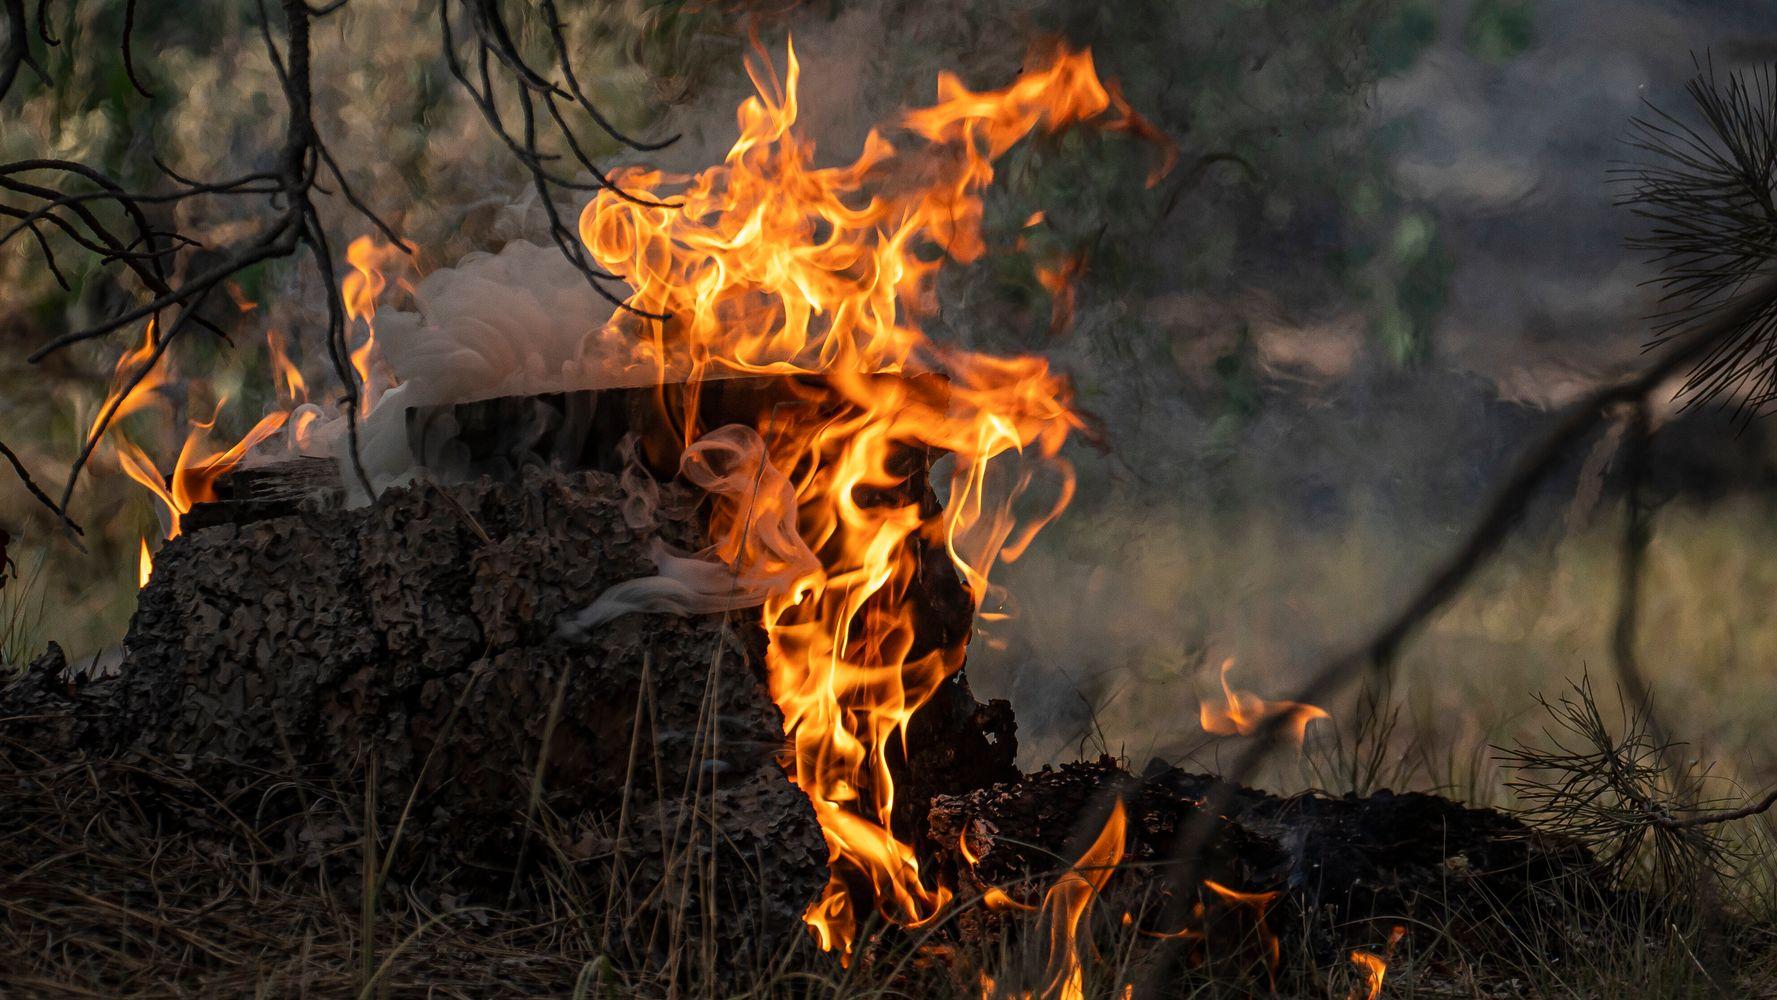 Oregon Gov. Warns Of 'Harsh Reality' Amid Mammoth Bootleg Fire